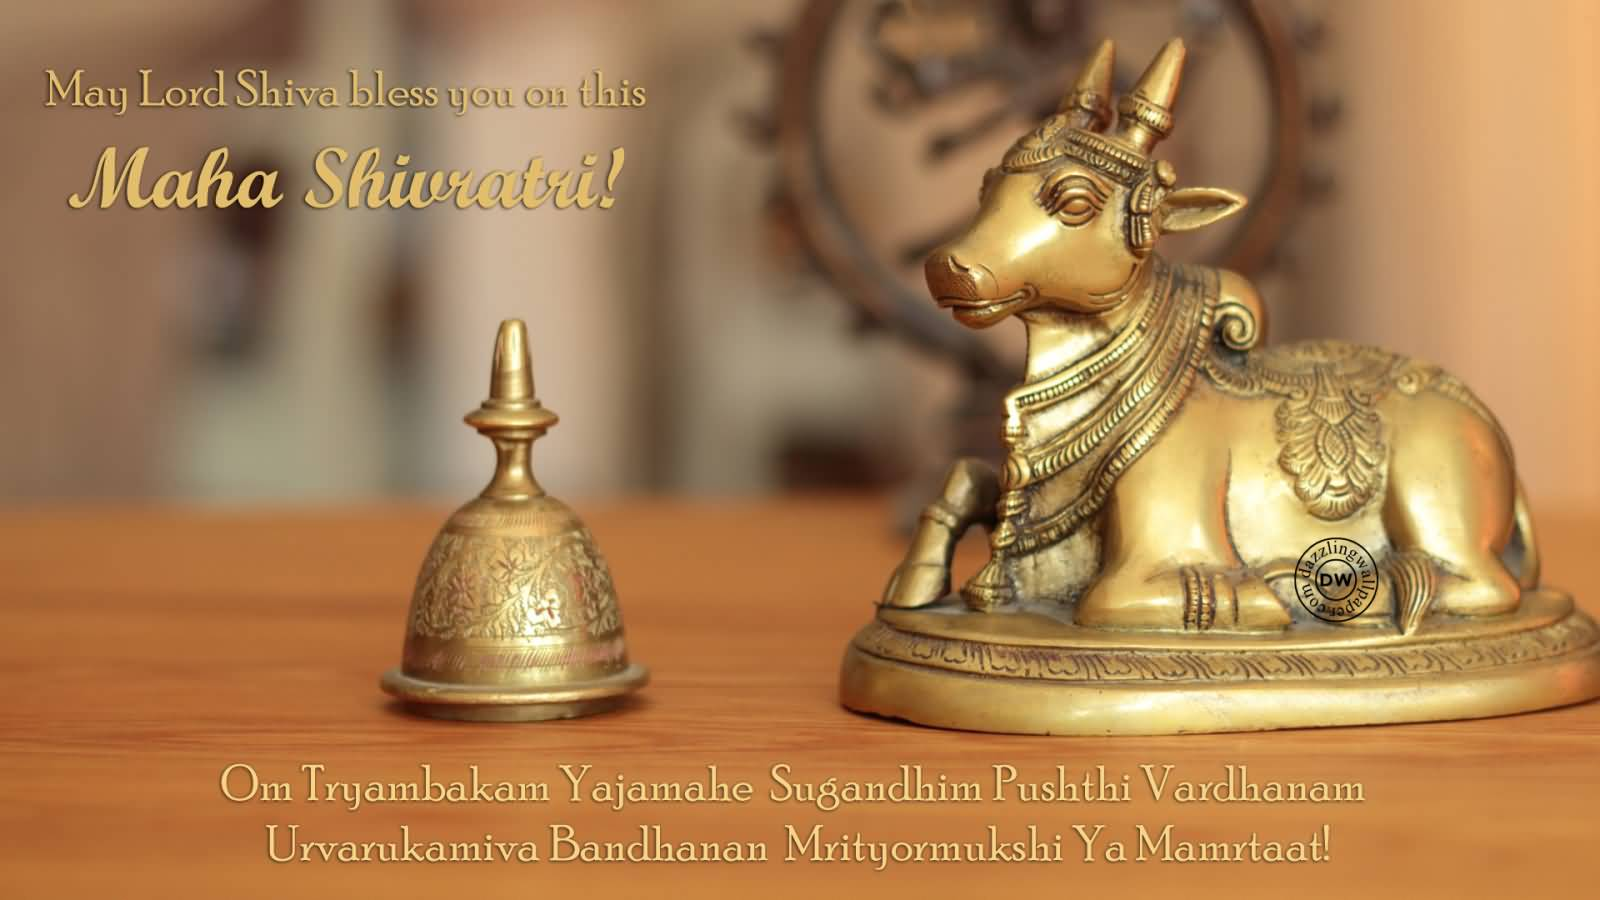 50+ Most Beautiful Maha Shivratri Greeting Pictures